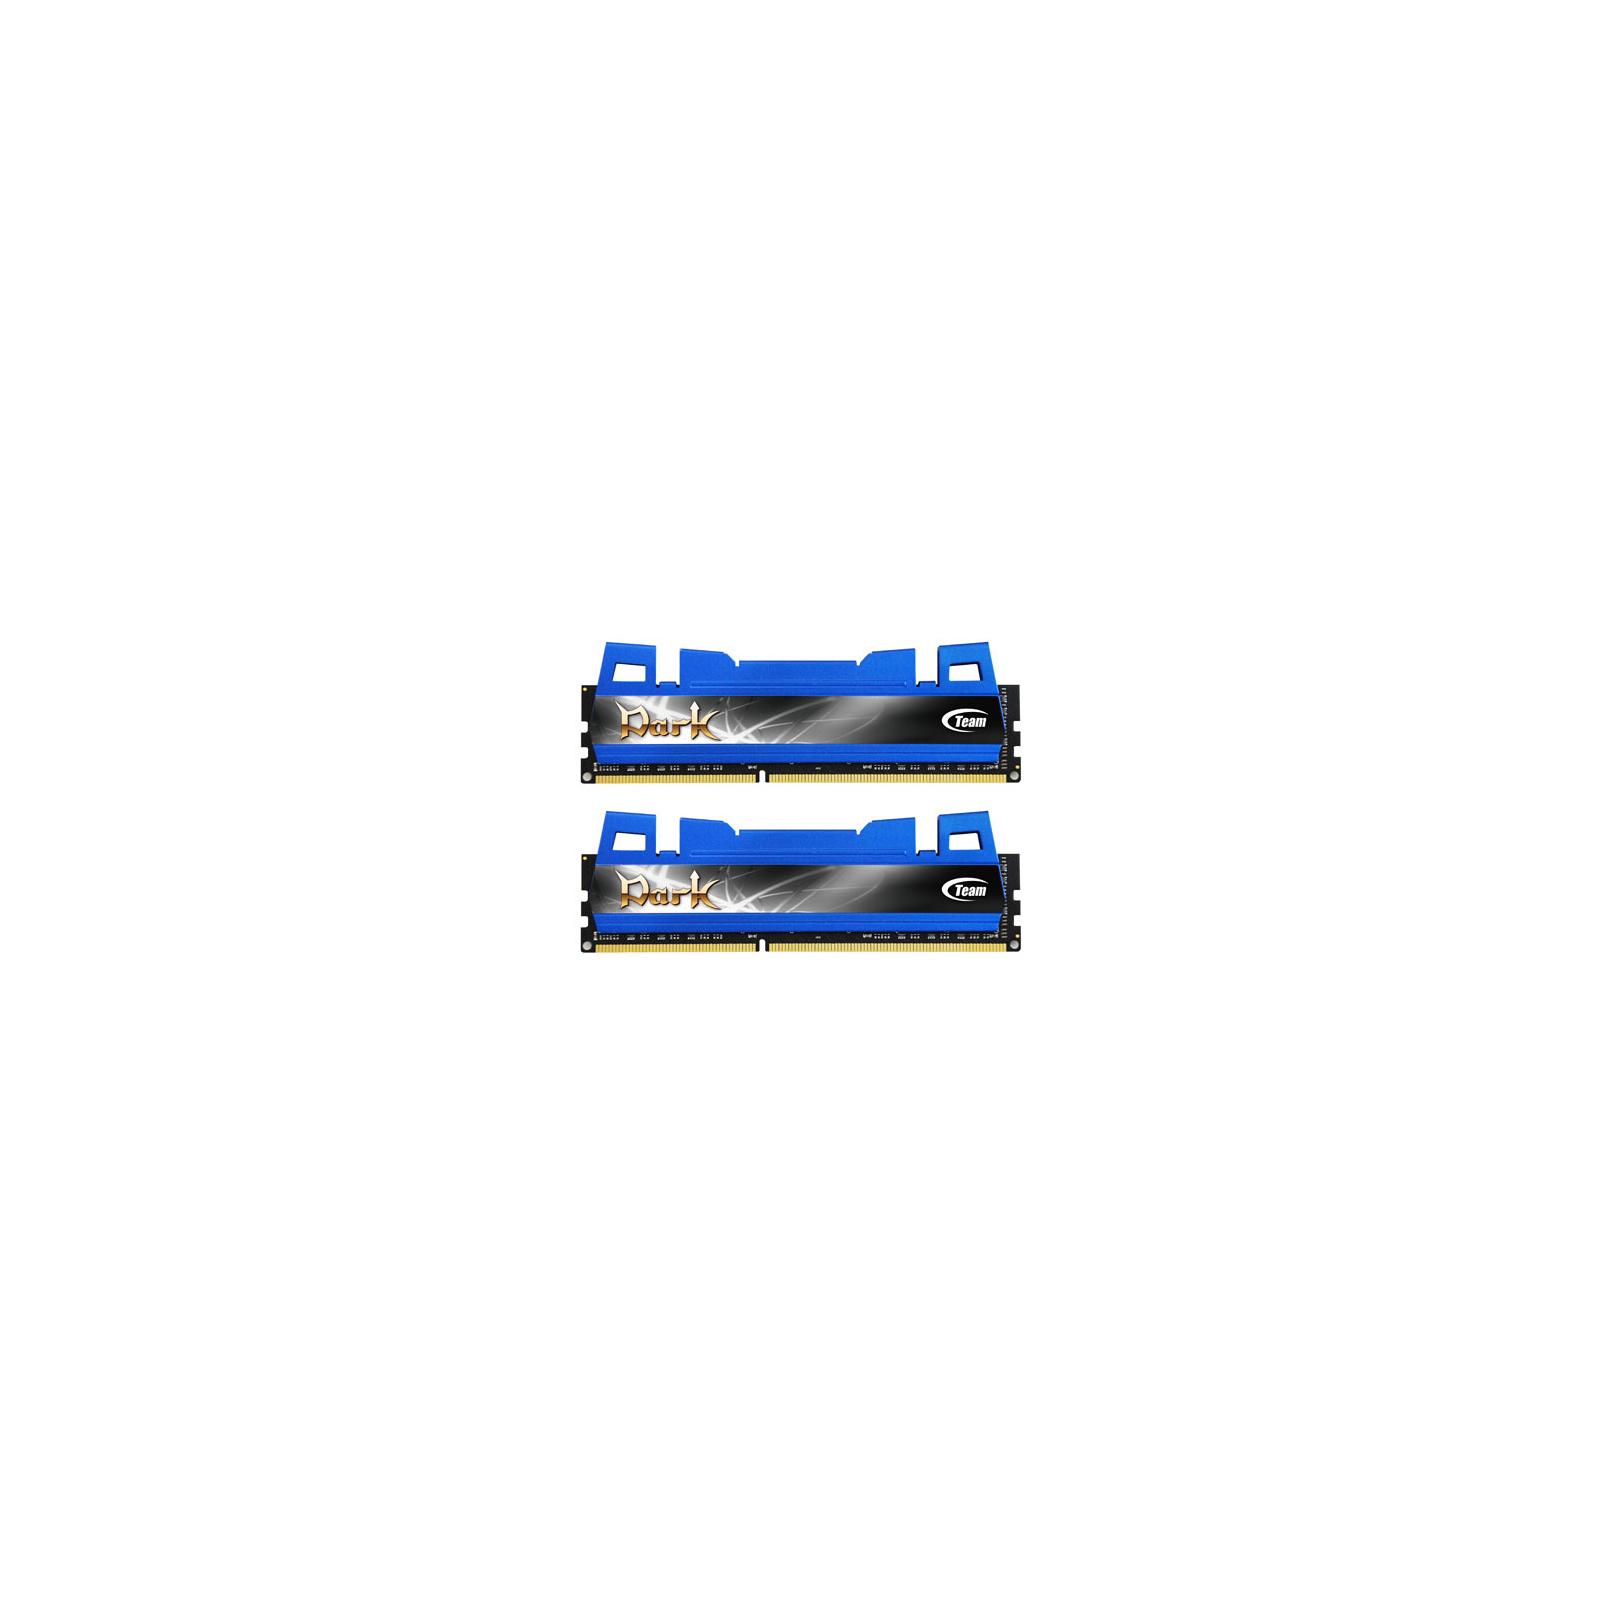 Модуль памяти для компьютера DDR3 16GB (2x8GB) 1600 MHz Team (TDBD316G1600HC9DC01)